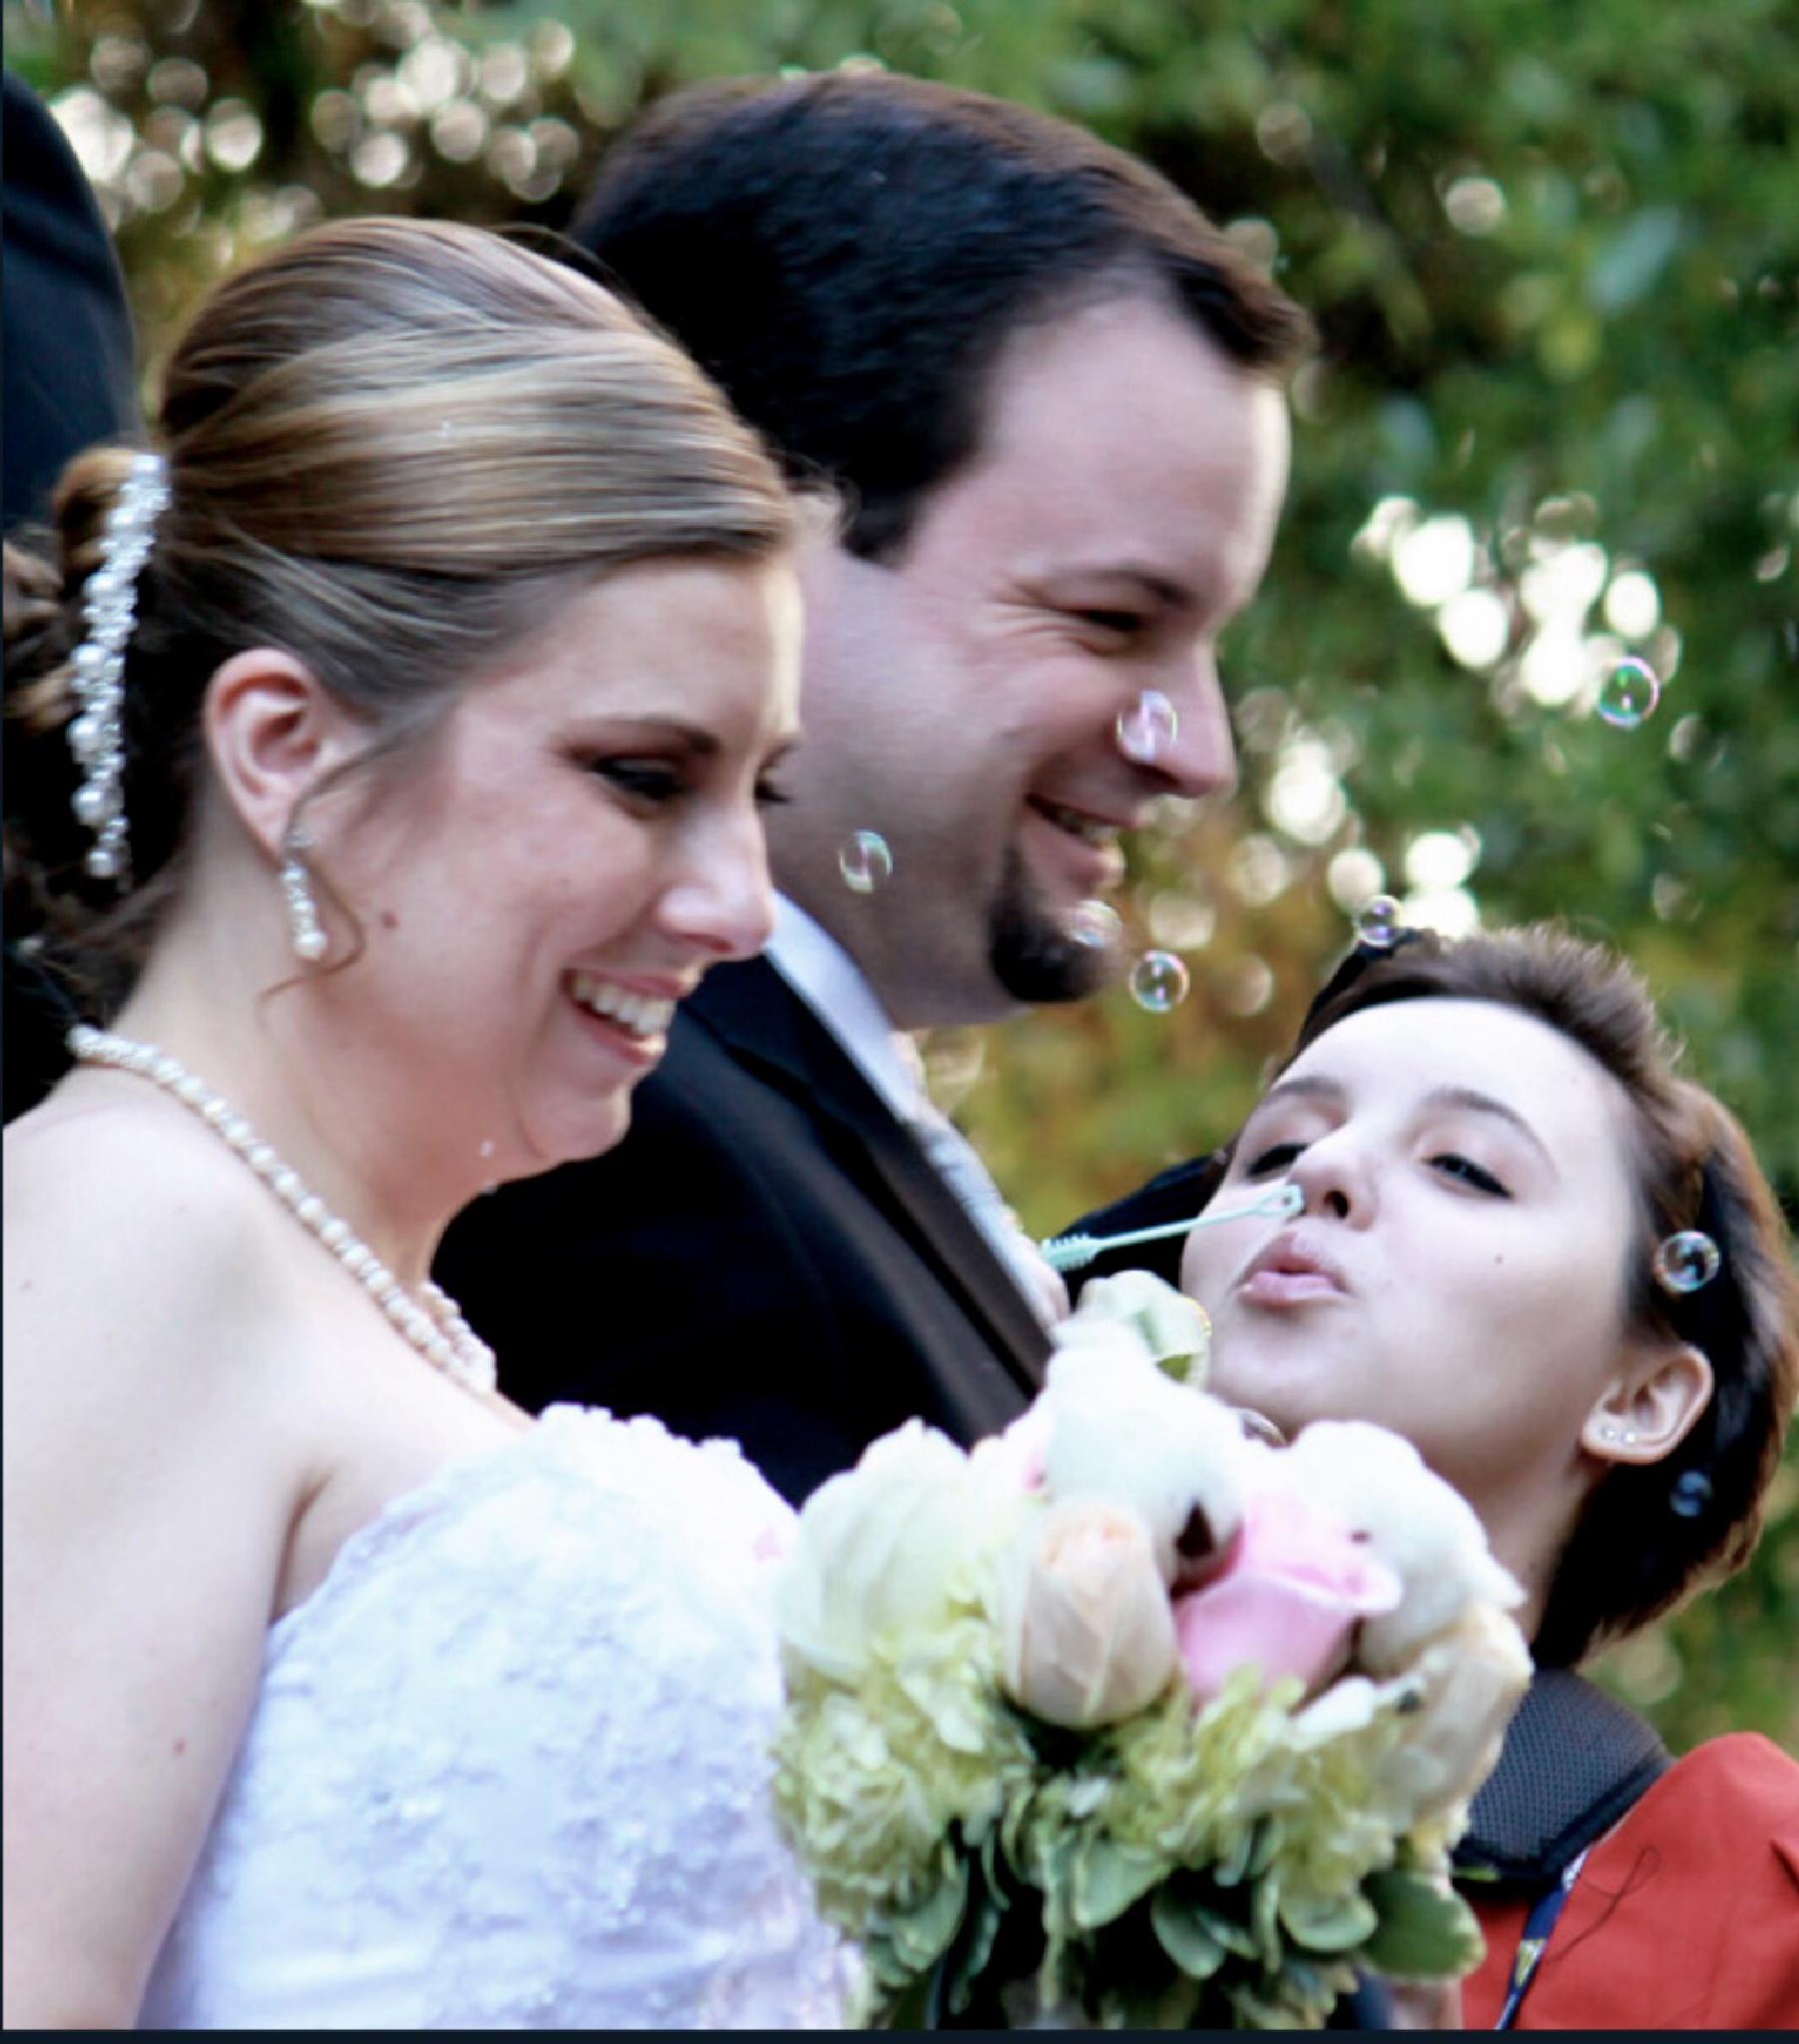 Wedding bubbles by Laine